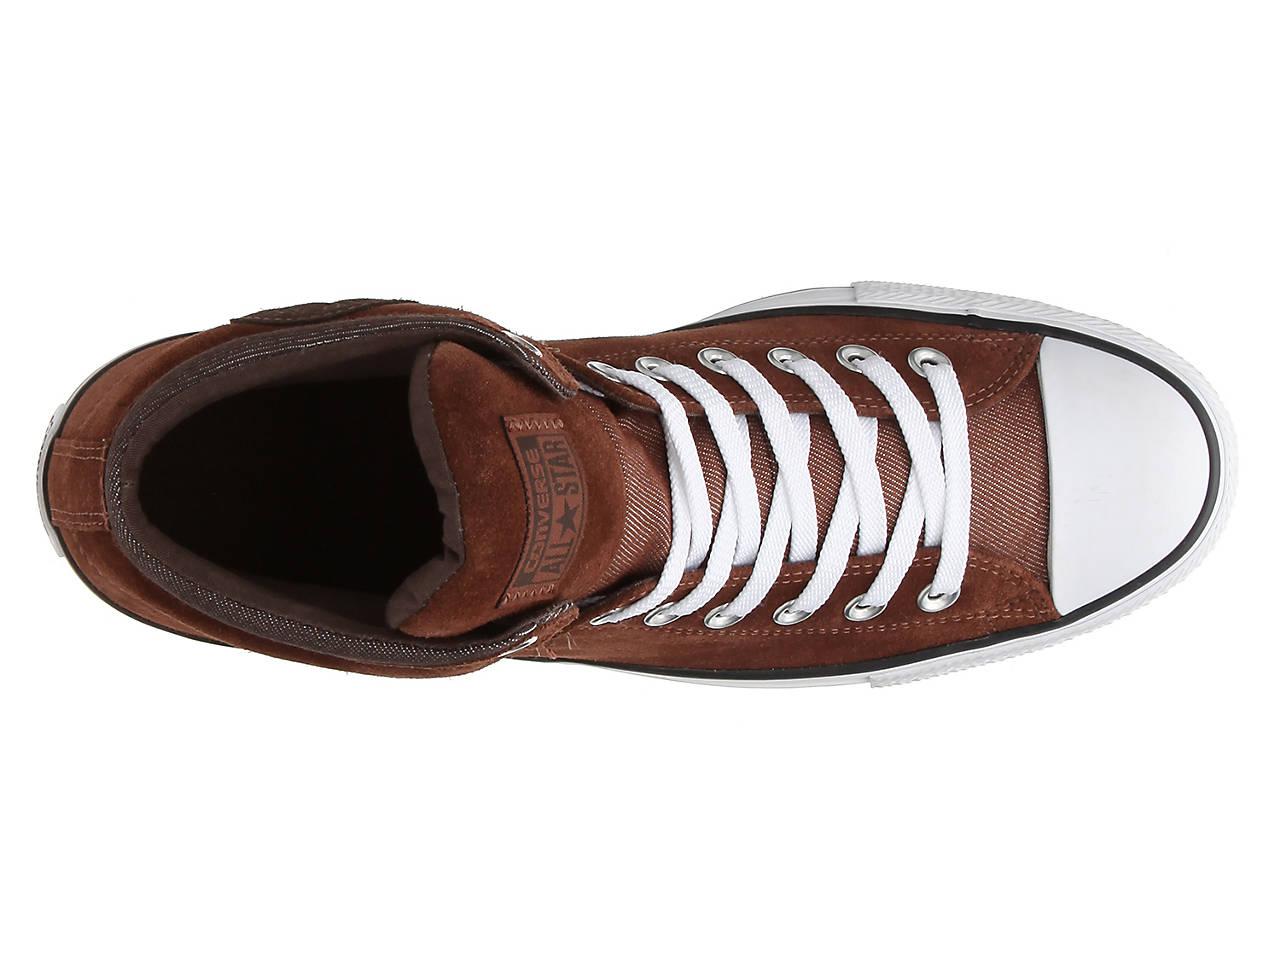 a4534421f08 Chuck Taylor All Star Hi Street Thermal High-Top Sneaker - Men s. next